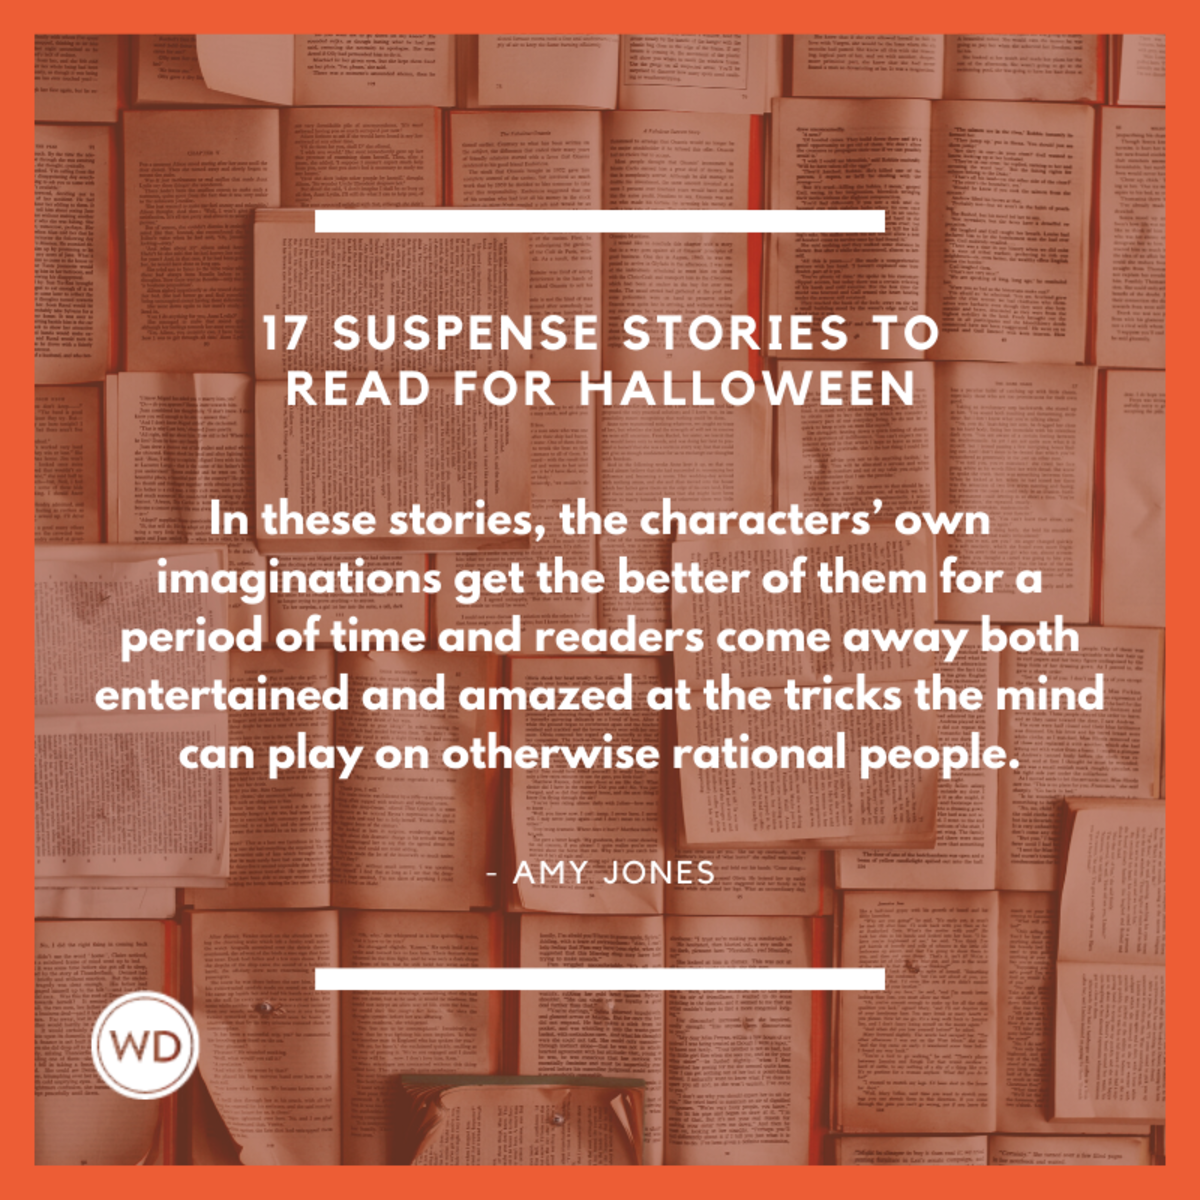 suspense storie